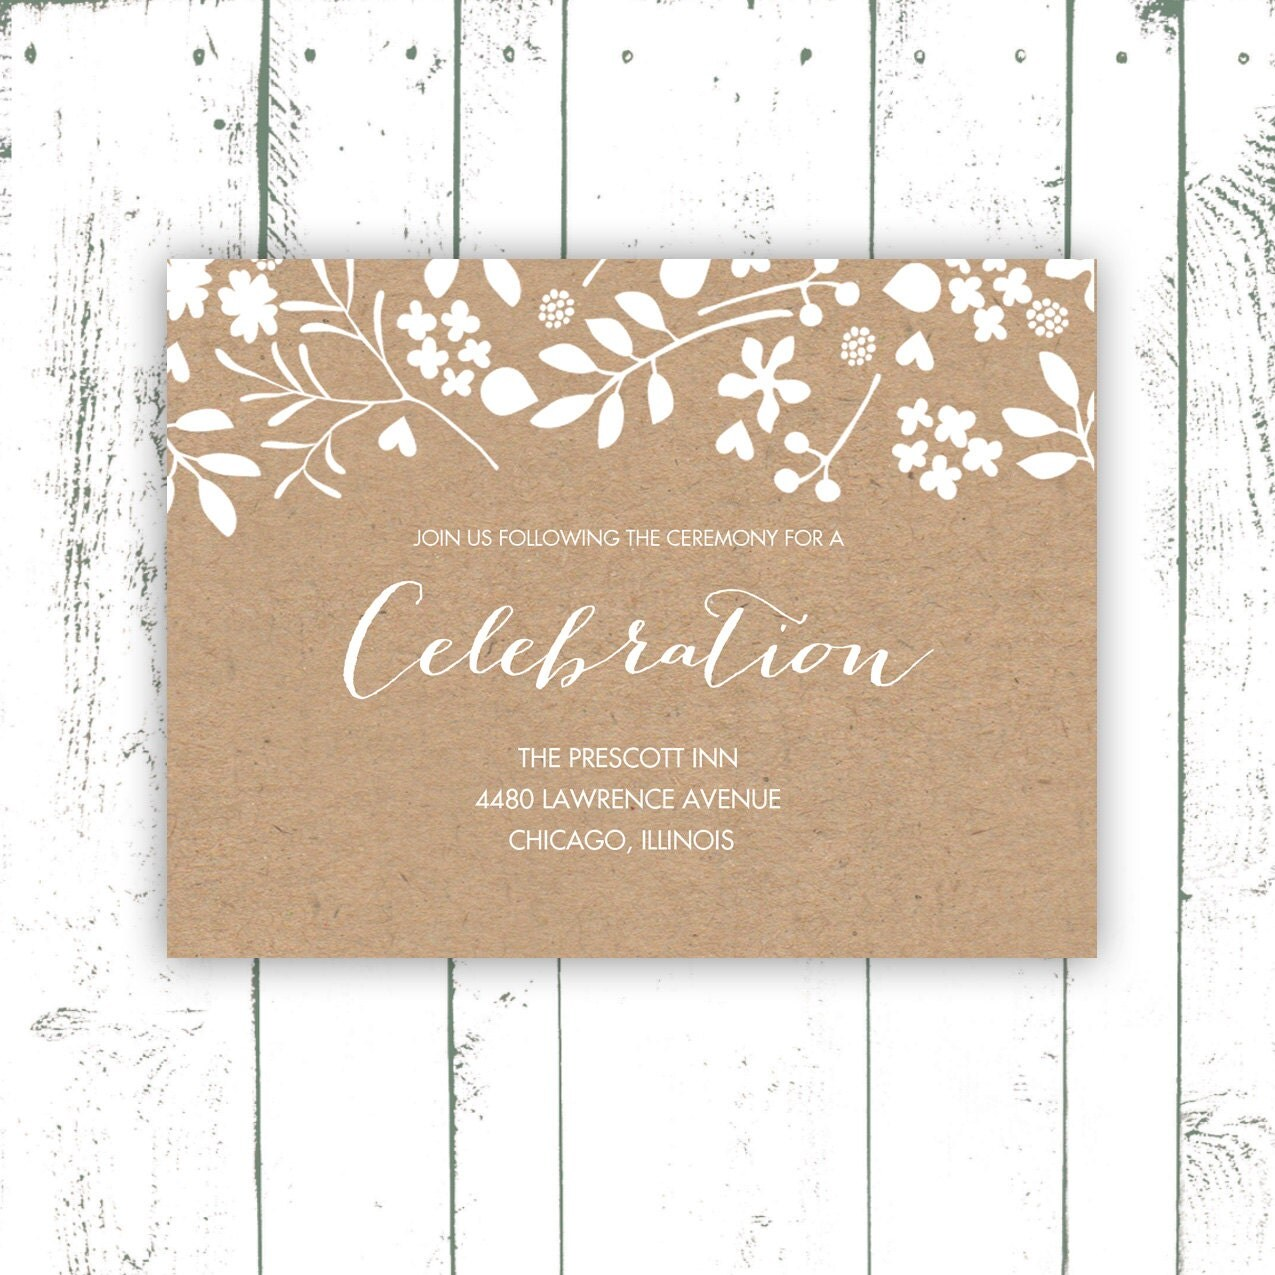 Wedding Enclosure Card Kraft Paper Enclosure Card With White Flowers Kraft Wedding Invitations